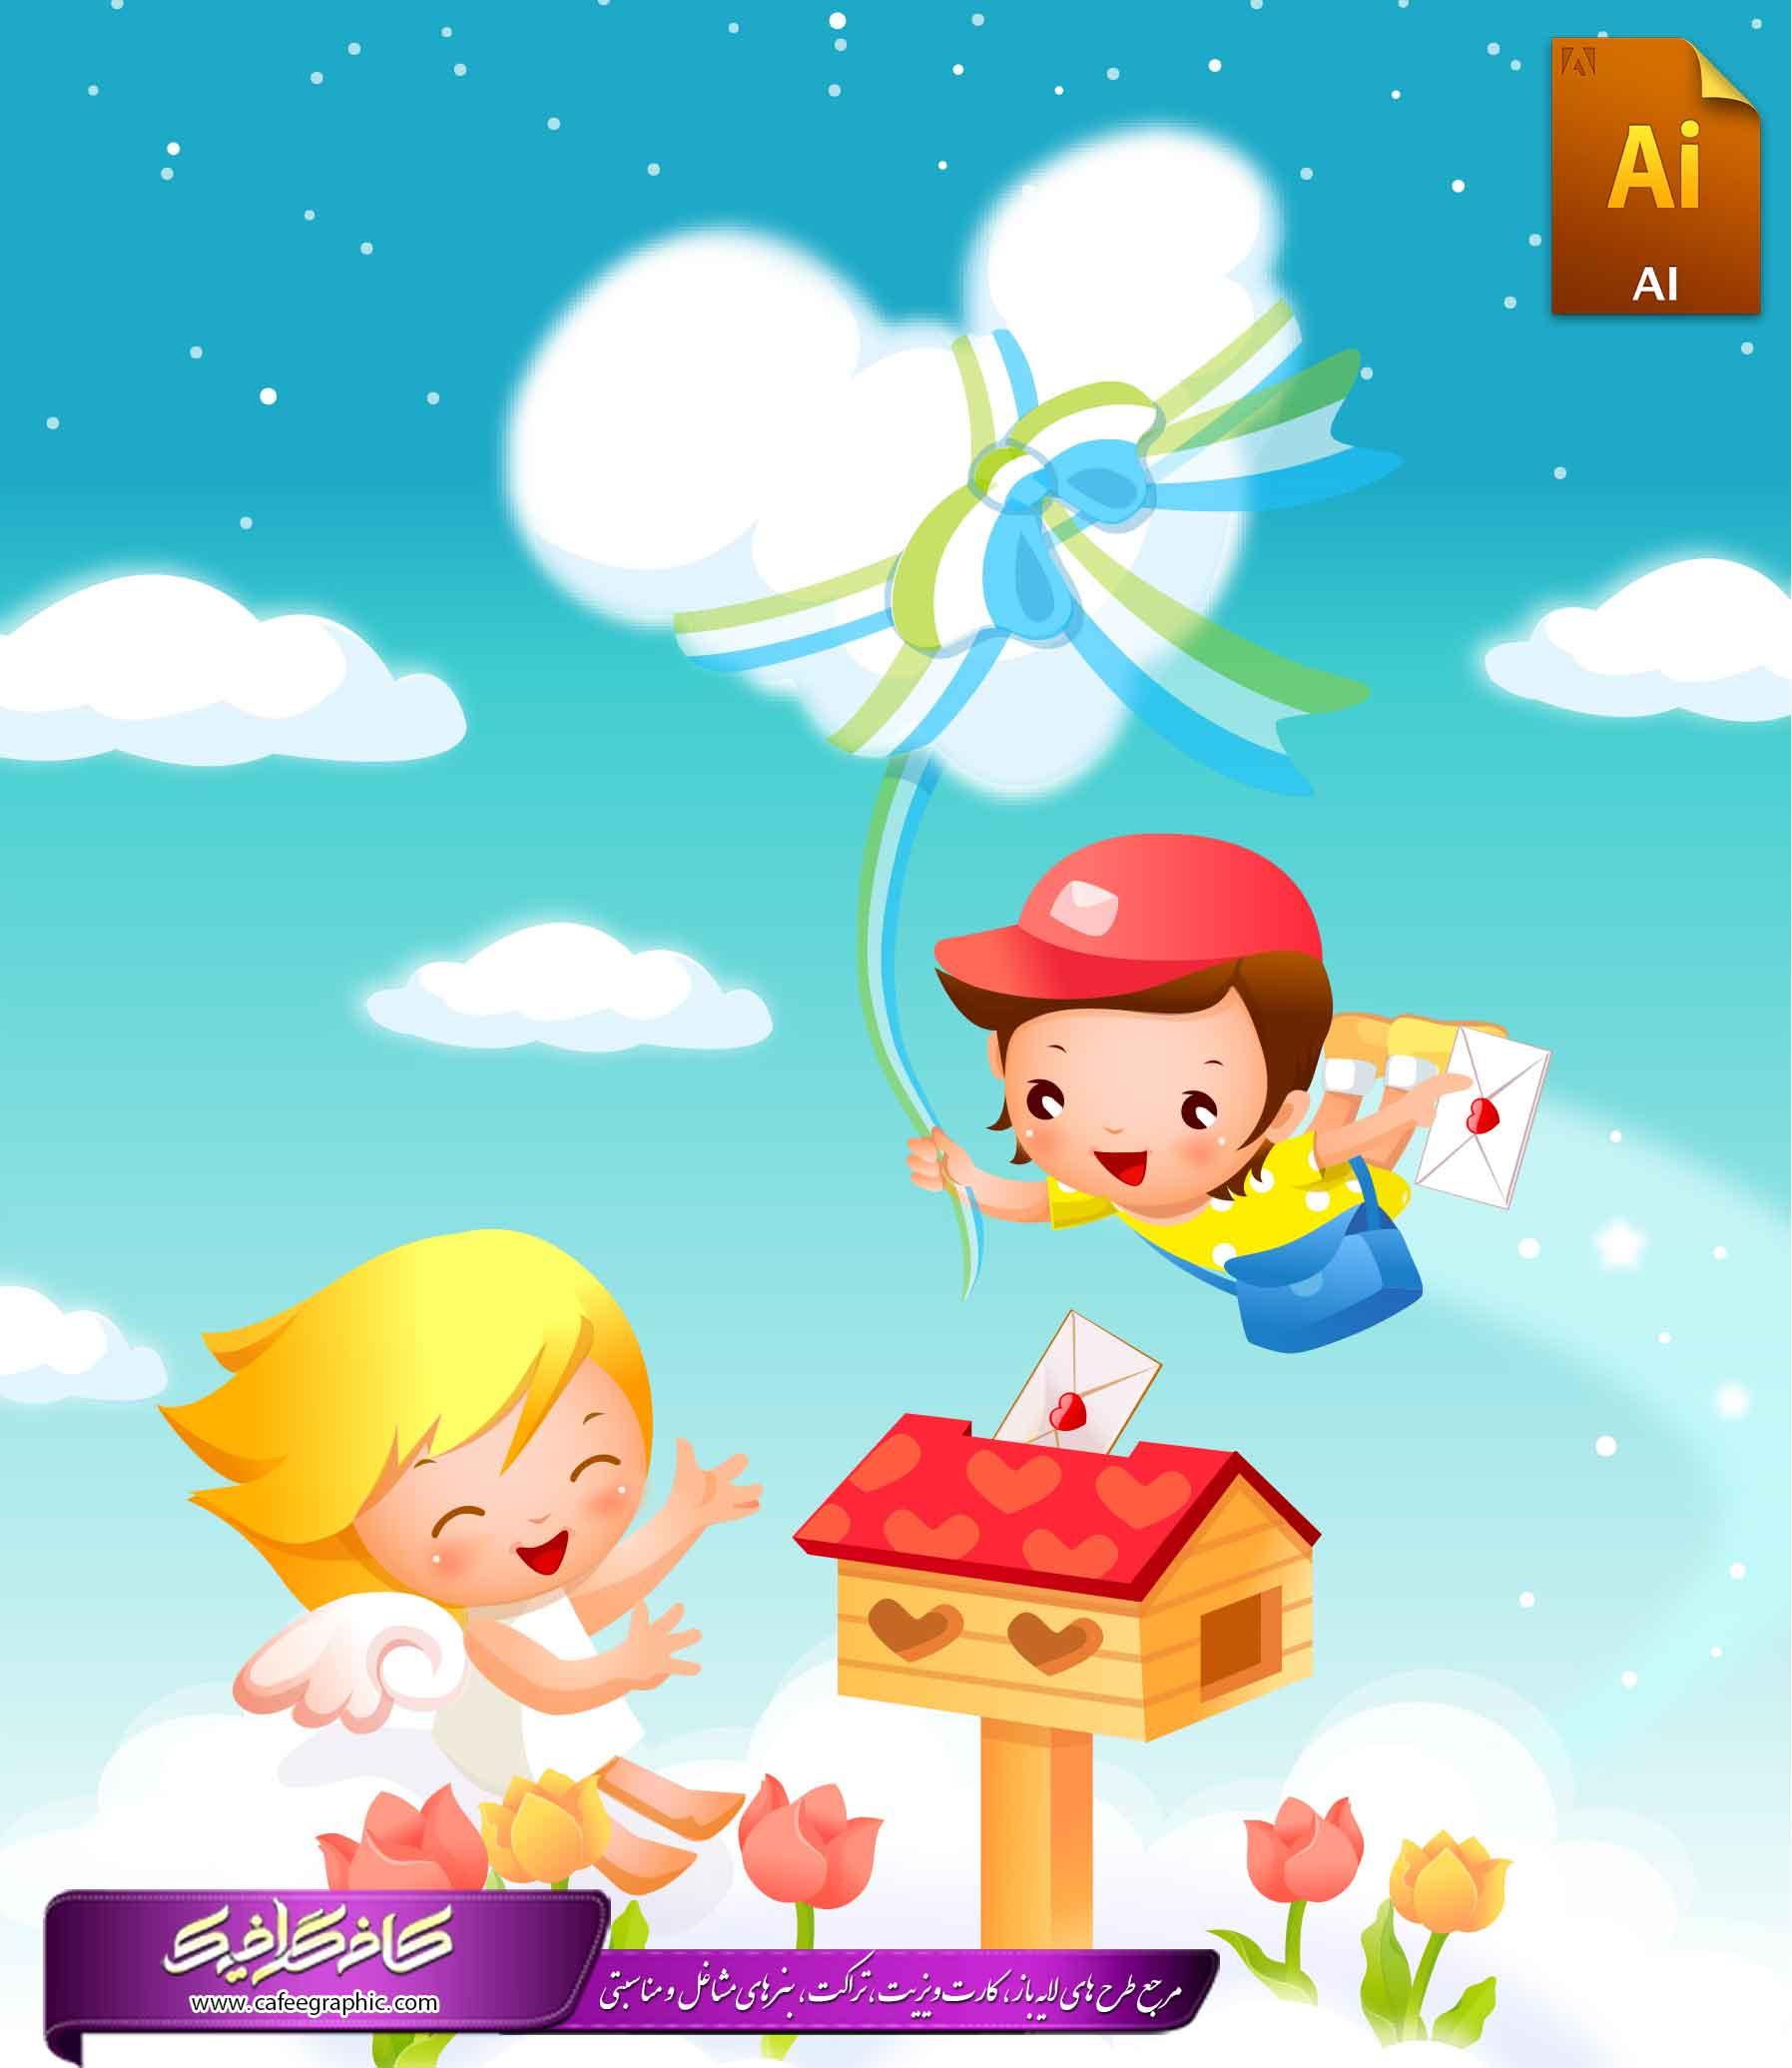 کارکتر و شخصیت کارتونی کودک در فرمت Ai و eps